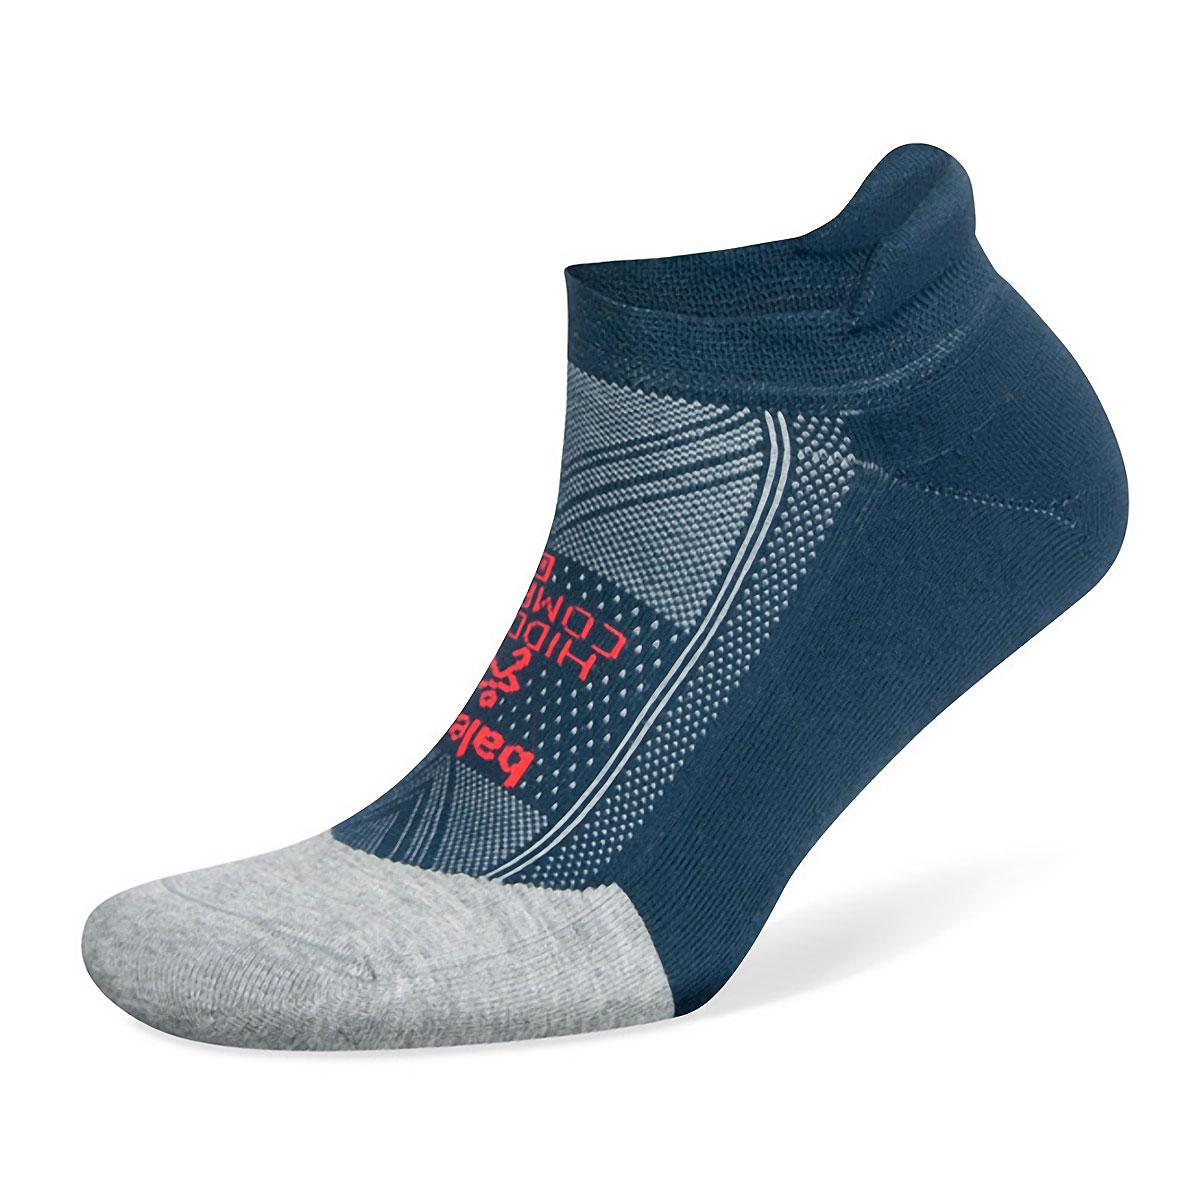 Balega Hidden Comfort Socks - Color: Midgrey/Legion Blue - Size: S, Midgrey/Legion Blue, large, image 1